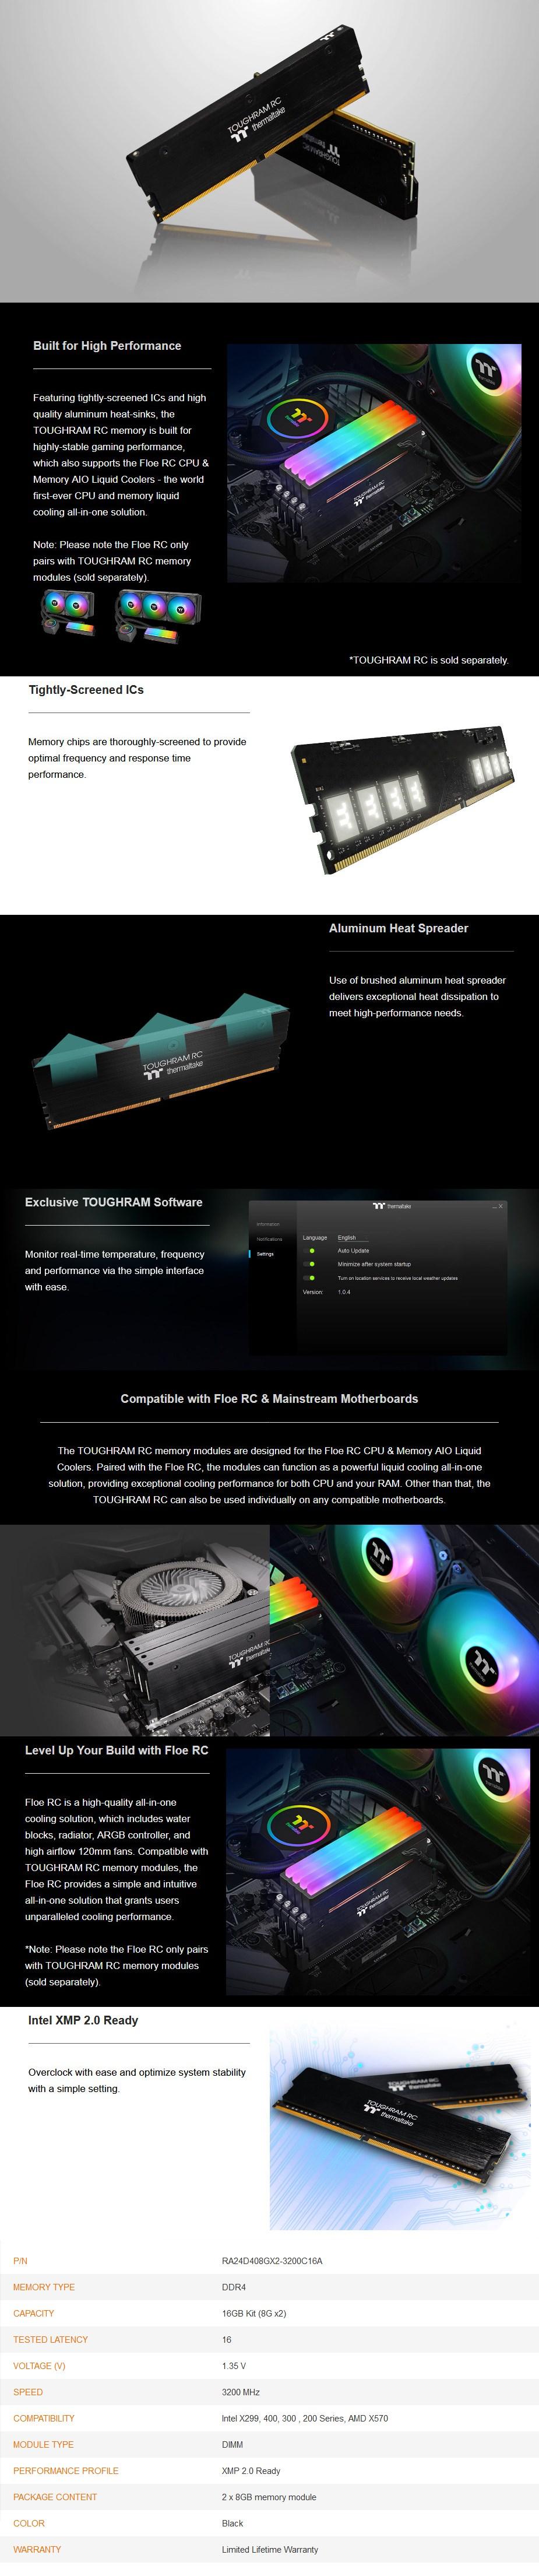 thermaltake_toughram_rc_16gb_2x8gb_ddr4_3200mhThermaltake TOUGHRAM RC 16GB (2x8GB) DDR4 3200MHz Memory - Black  - Overview 1z_memory_black_ac37269_4.jpg (925×4418)